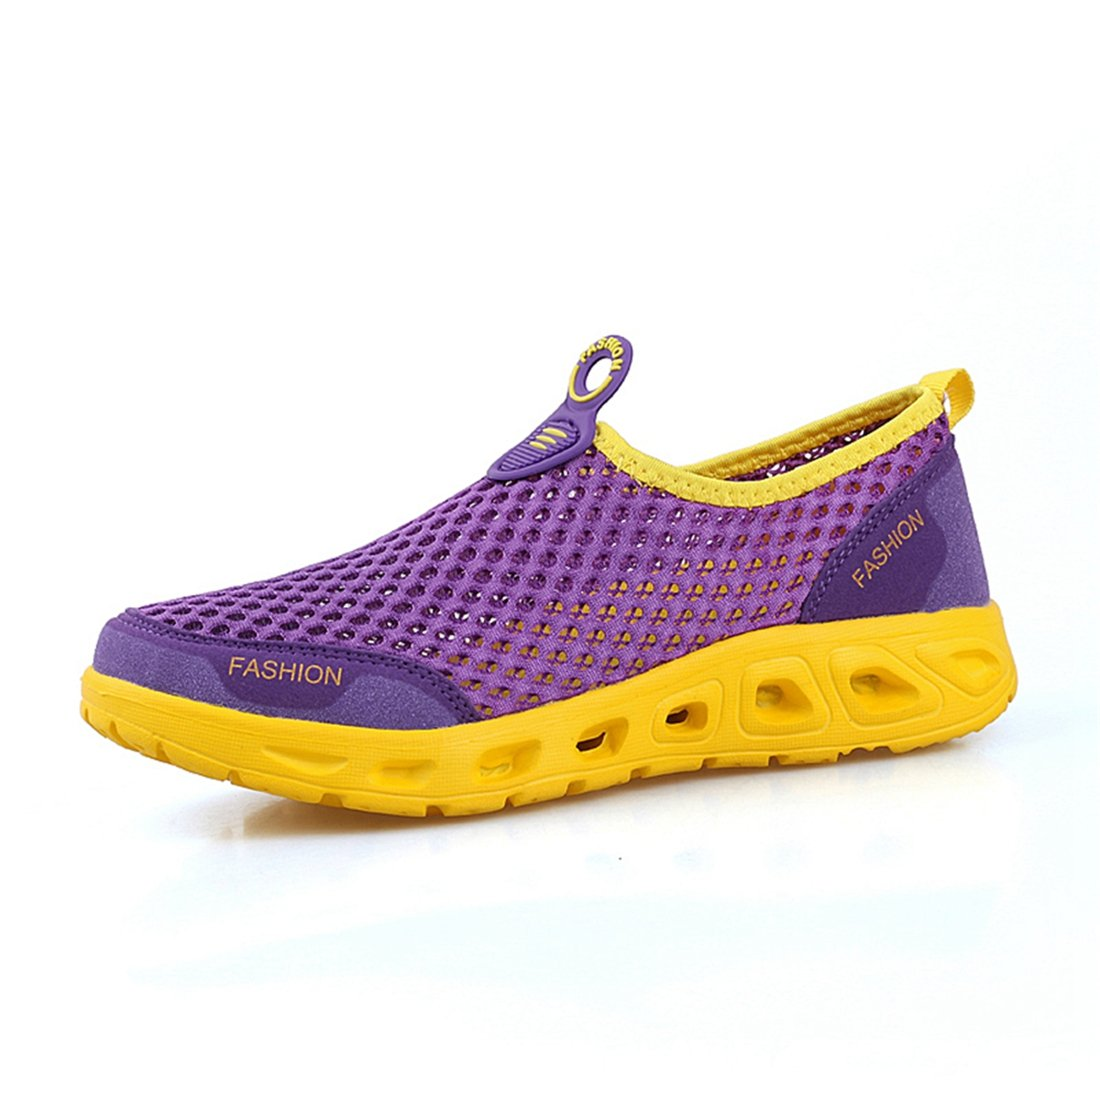 Women's Men's Quick Drying Aqua Water Shoes Mesh Slip On Shoes Purple 250mm:9 B(M) US Women/7 D(M) US Men